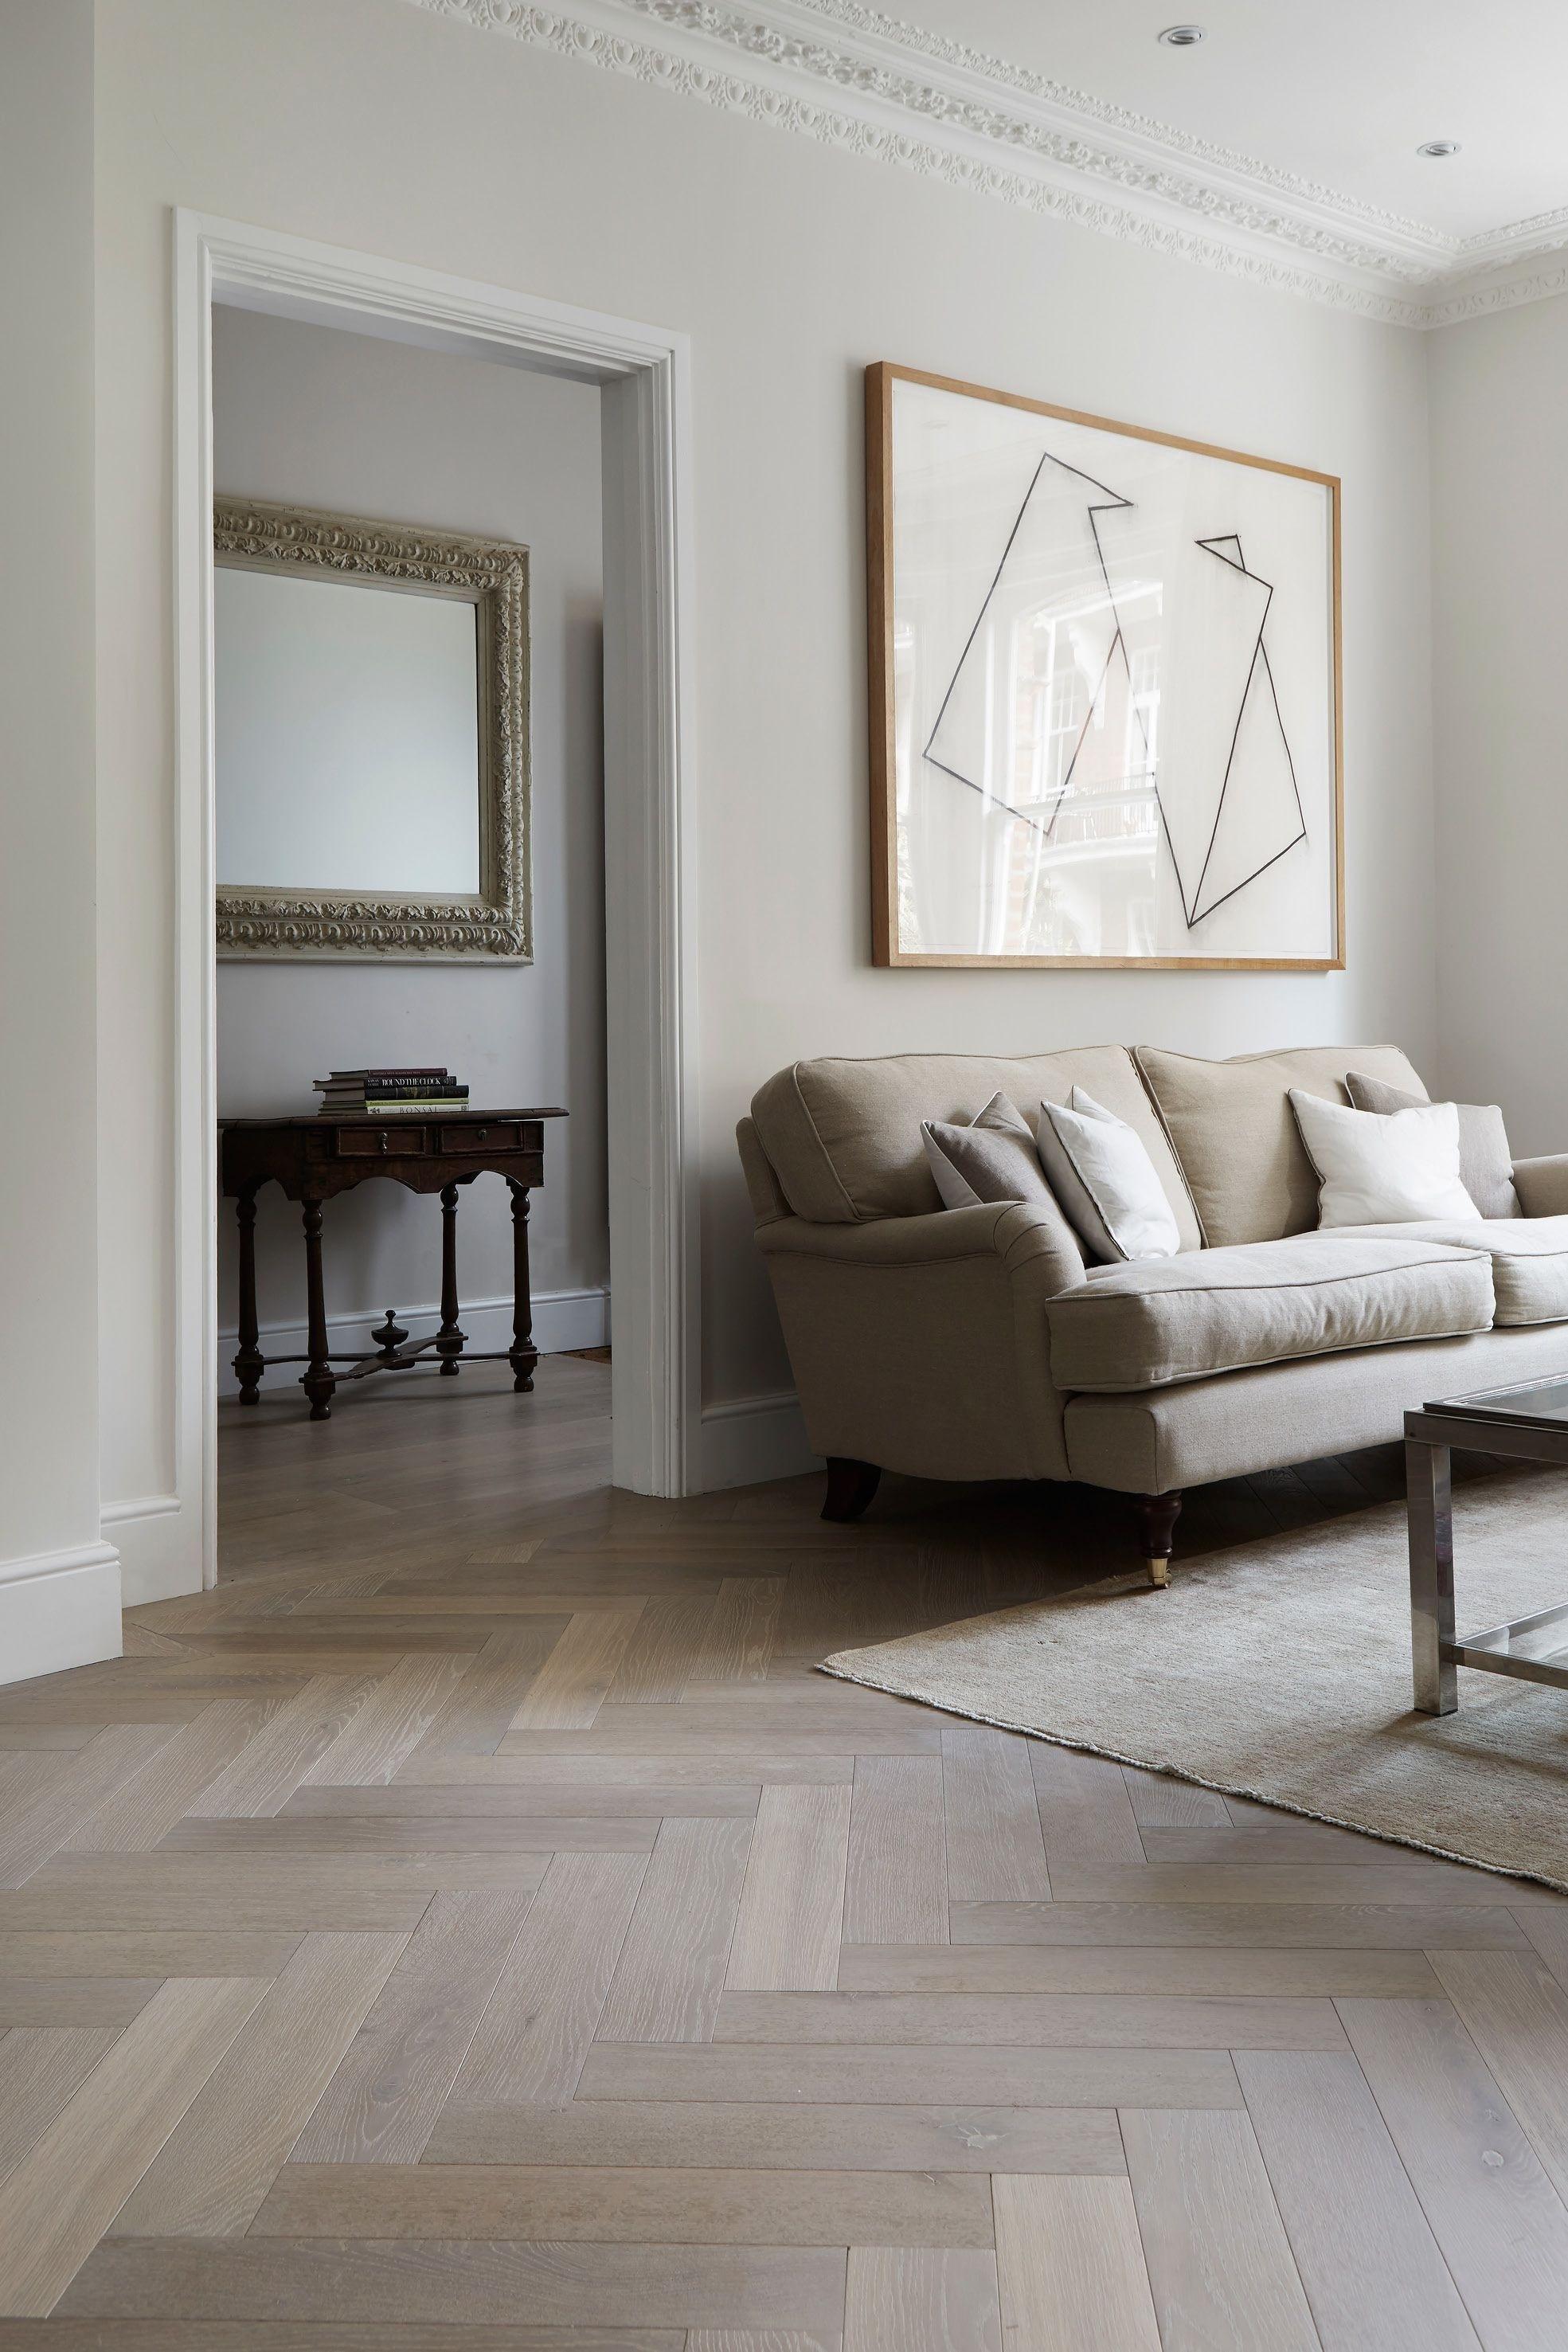 how to make hardwood floors of 26 unique grey hardwood floors photos flooring design ideas with decorating ideas for living rooms with hardwood floors elegant home